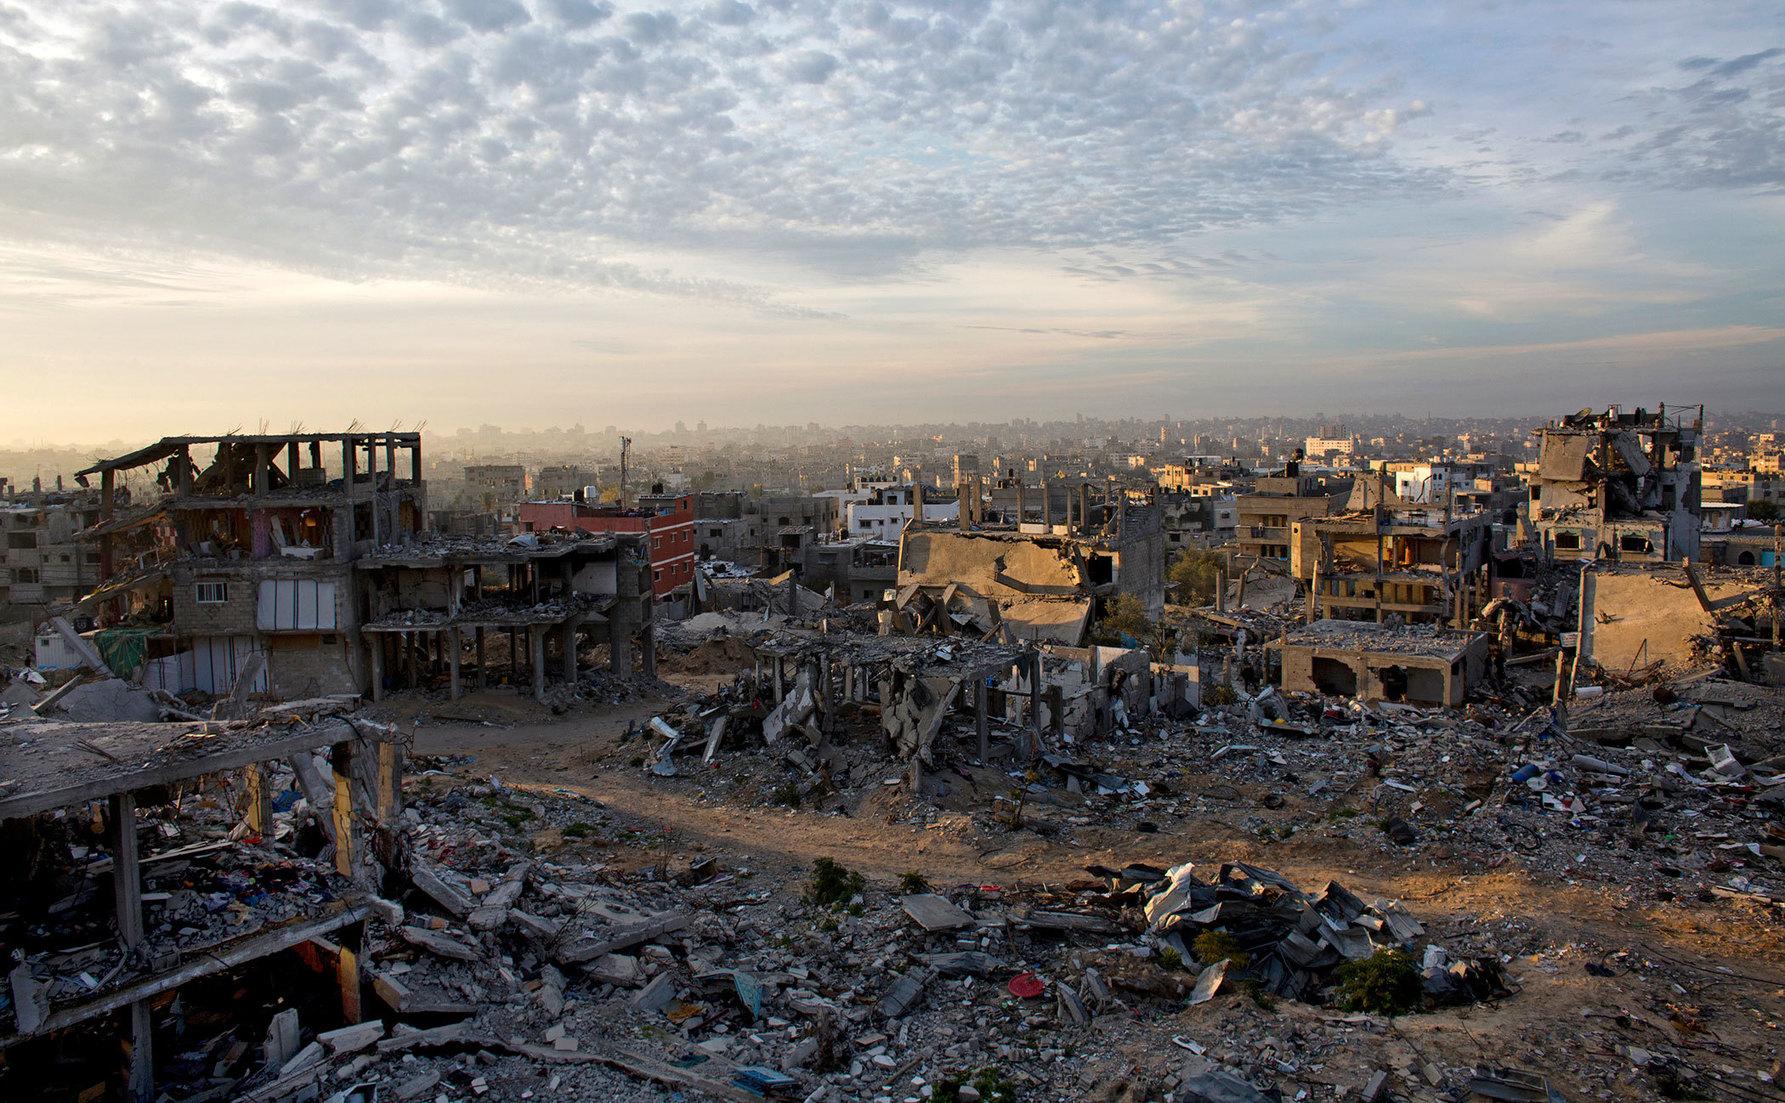 Half a year after devastating war, life in Gaza seems worse than ever. - Post - Arab America